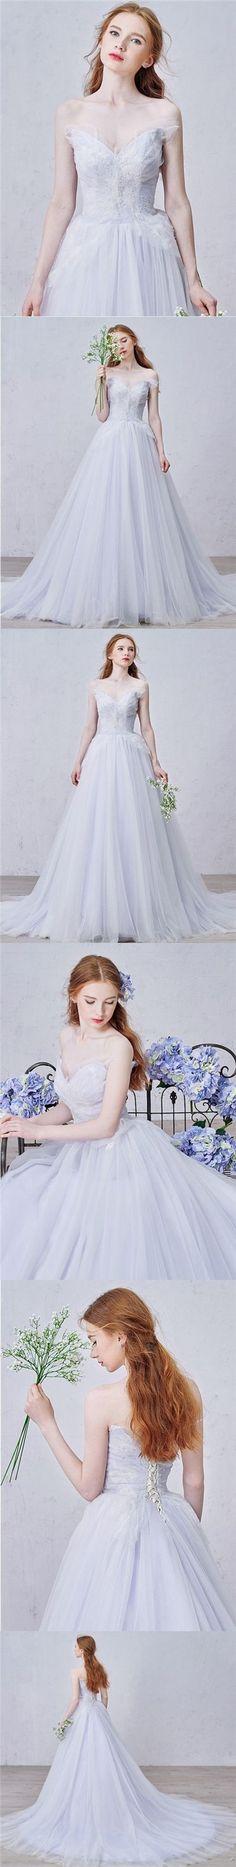 Beautiful Fairy Prom Dresses Sweetheart Sweep/Brush Train Prom Dress/Evening Dress JKL110